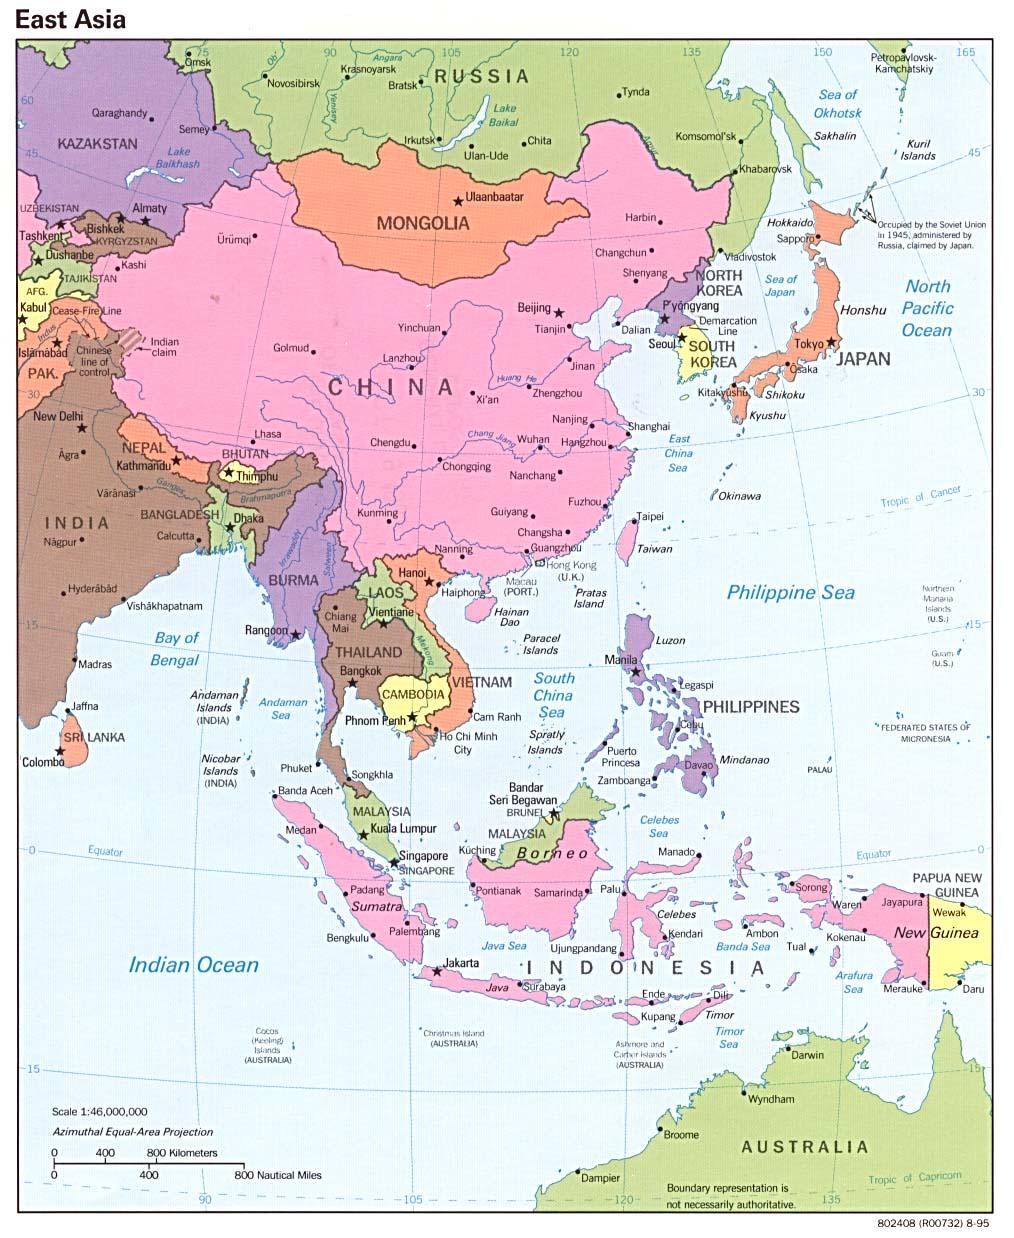 Mapa Politico de Asia del Este 1995